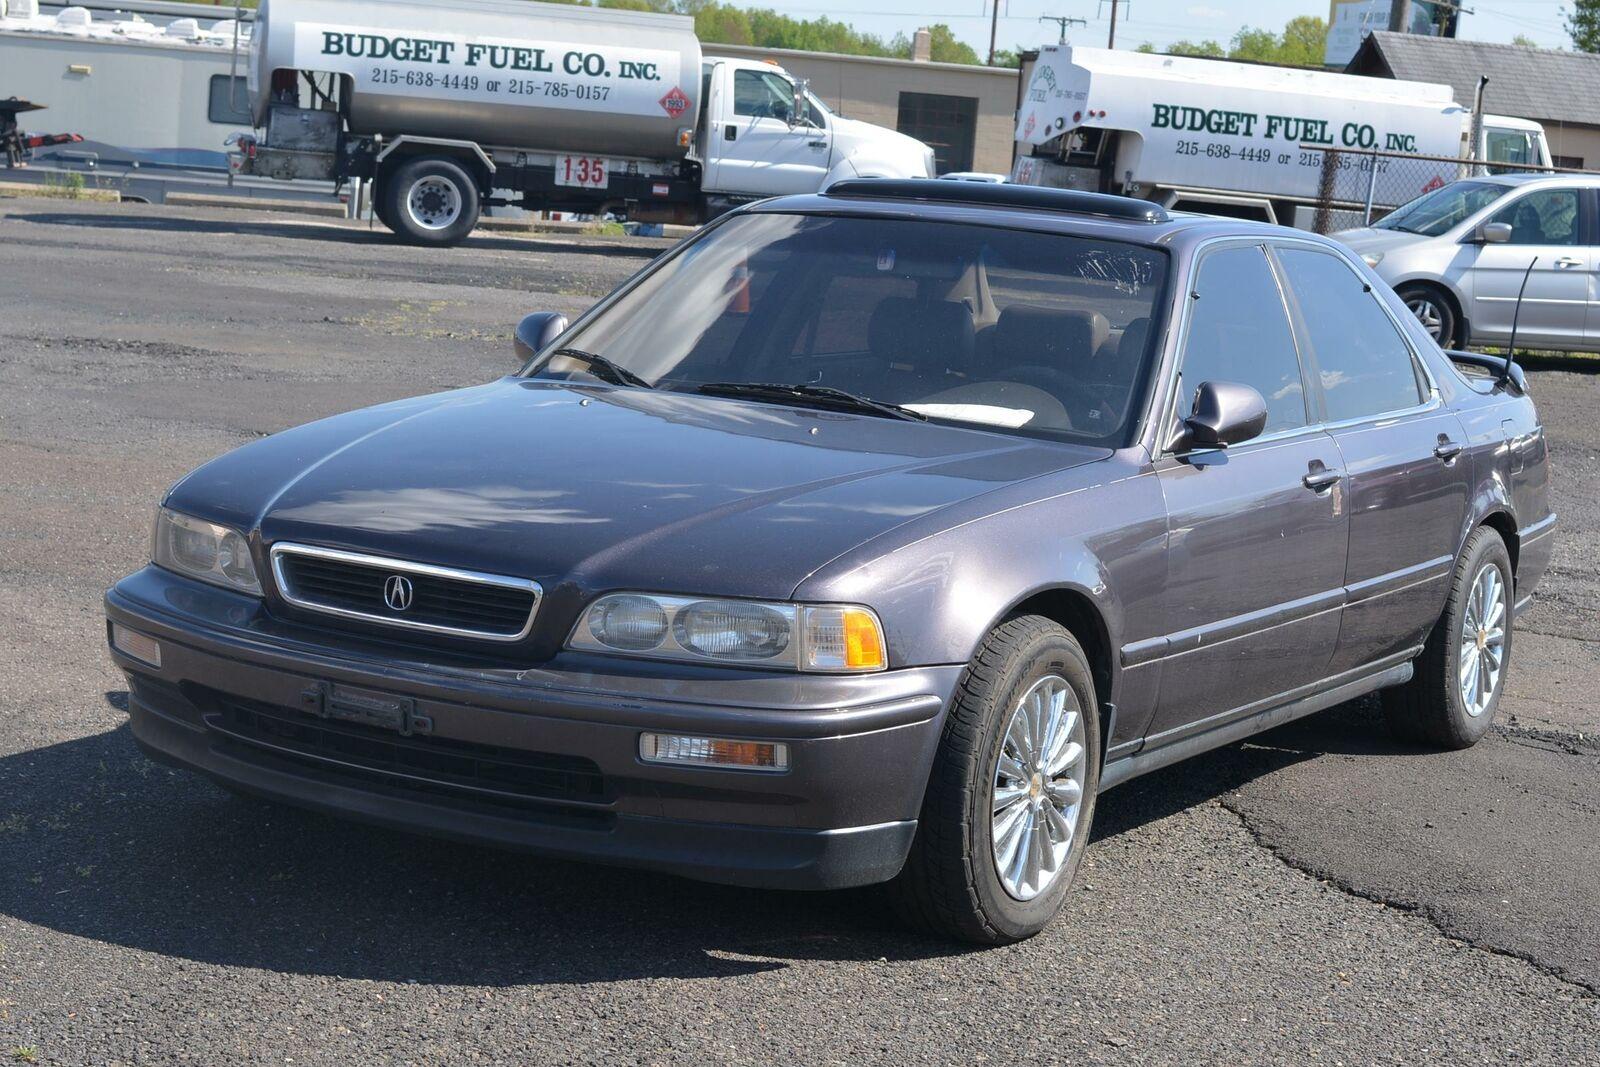 1993 Acura Legend Automatic , Engine Smoke Need Repair ...